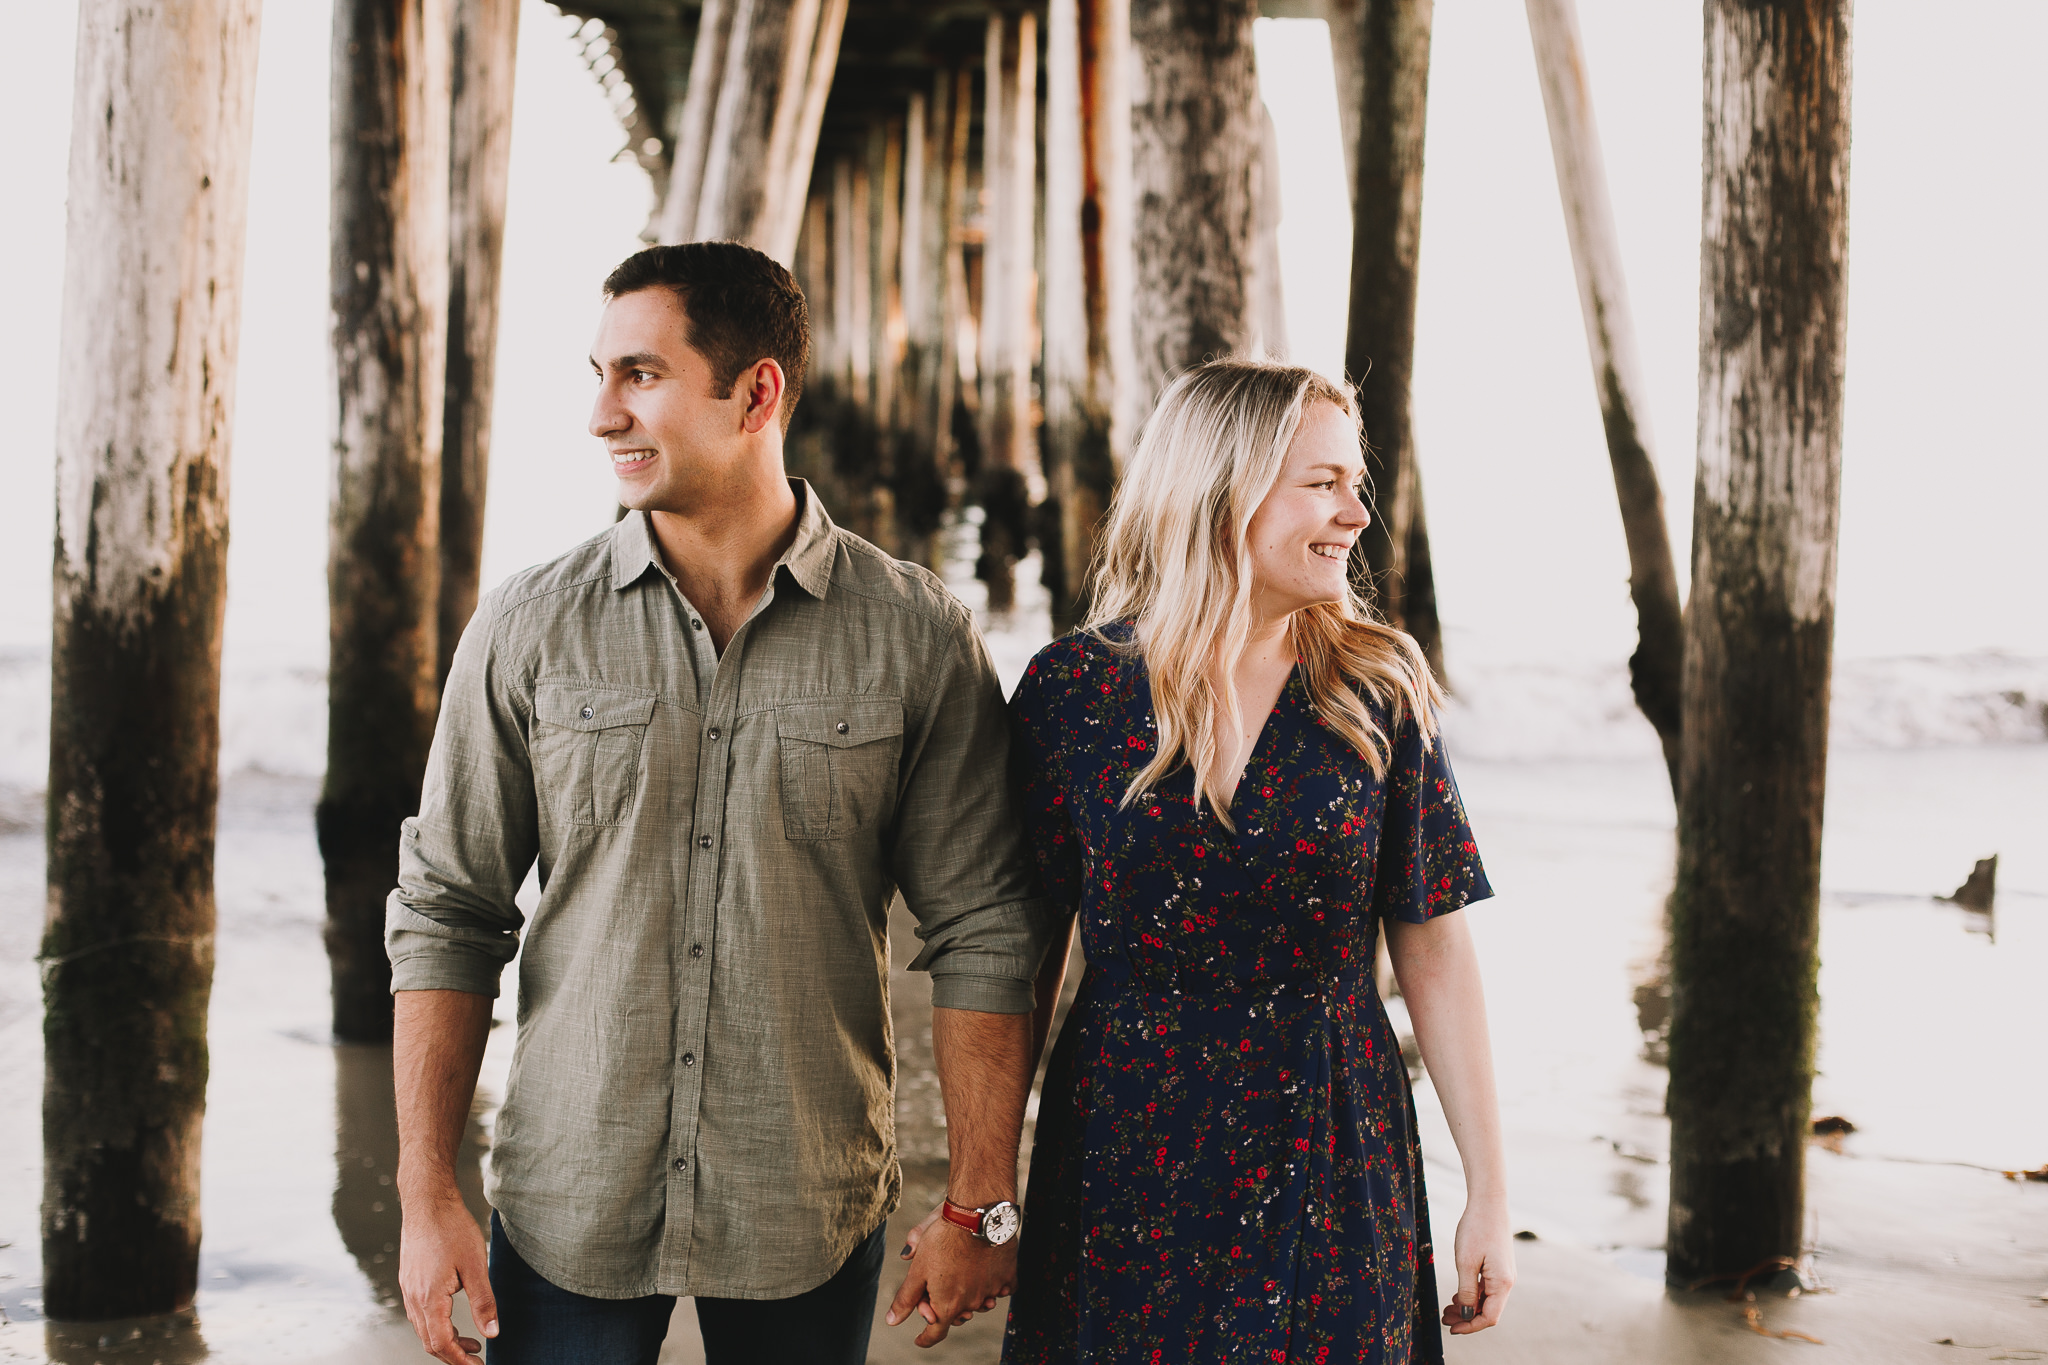 Archer Inspired Photography Capitola Beach Santa Cruz Wedding Engagement Lifestyle Session Photographer-128.jpg